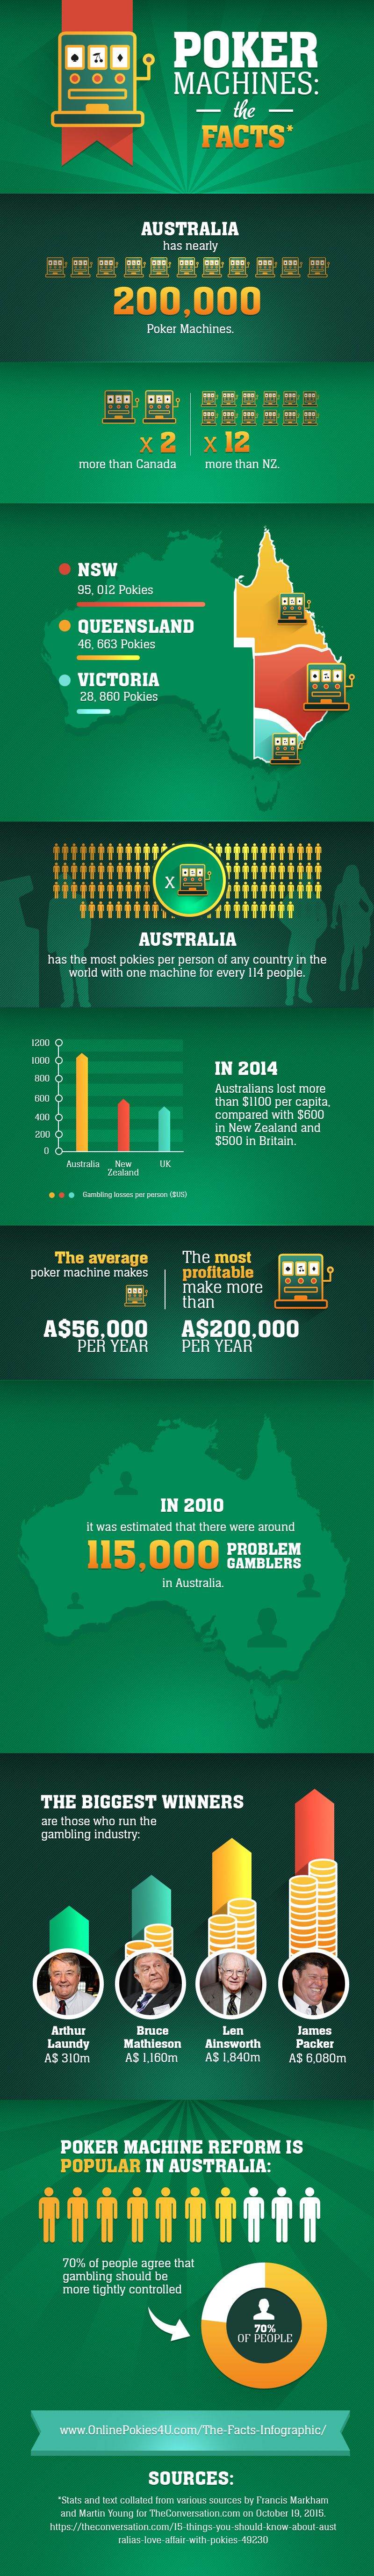 Poker Machines in Australia The Facts Poker machine